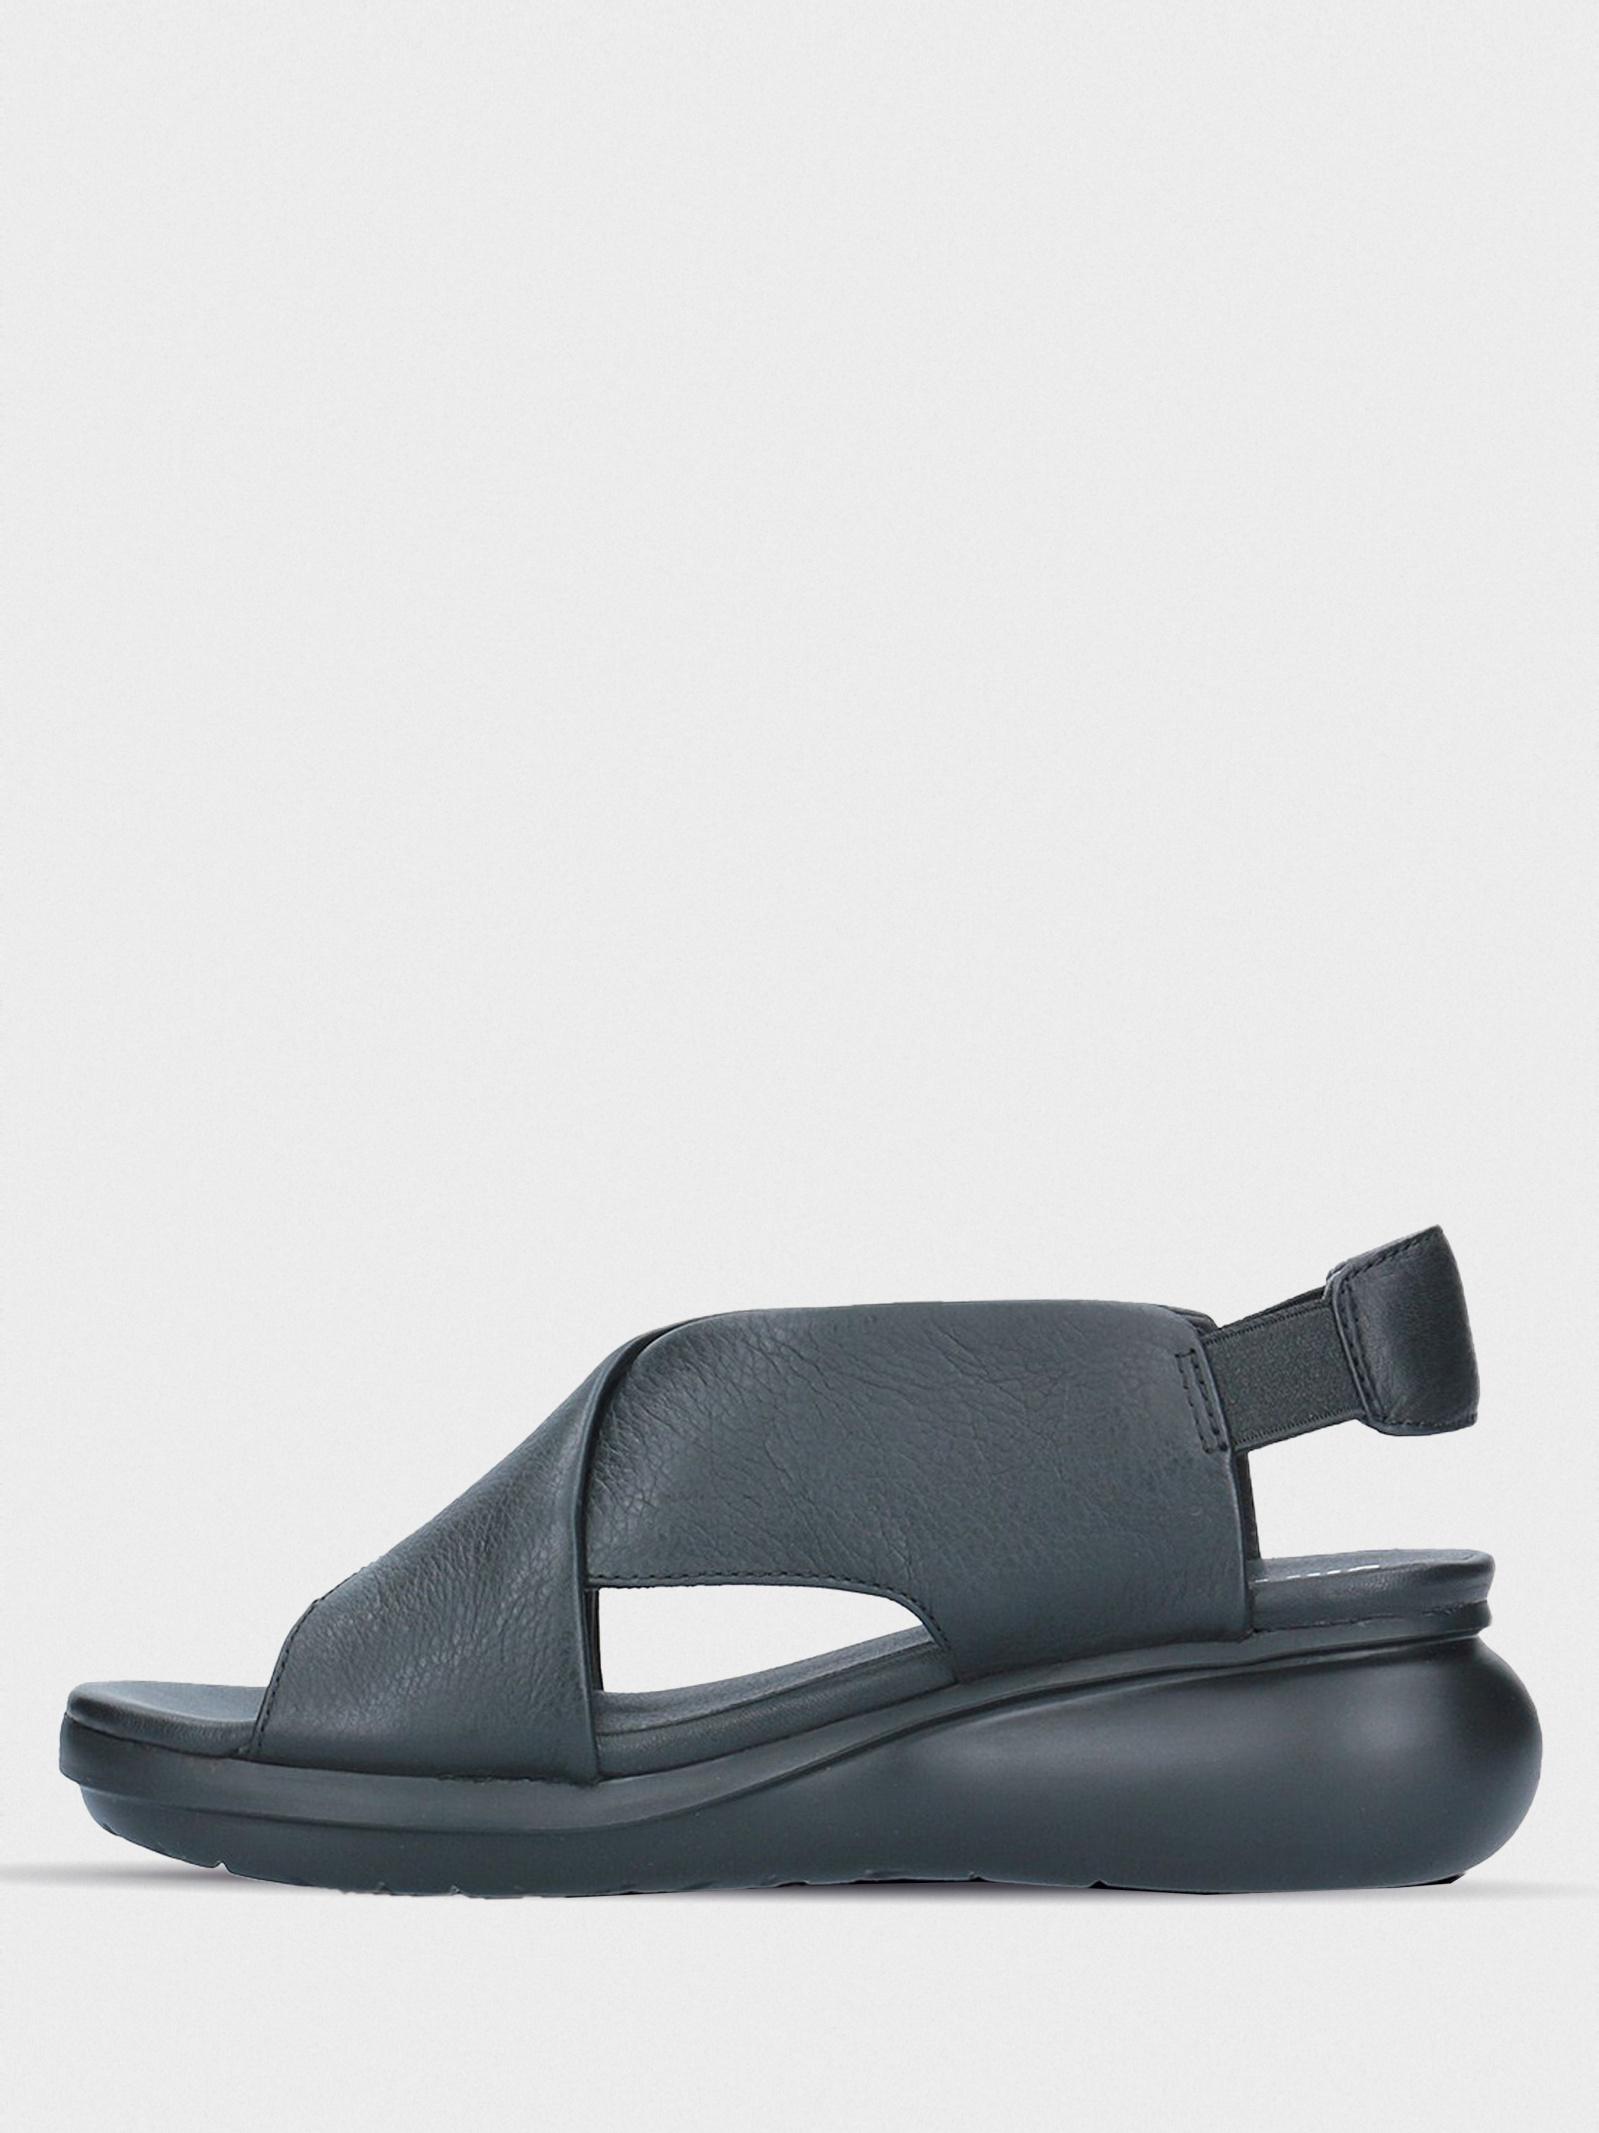 Сандалии для женщин Camper Balloon AW1083 размеры обуви, 2017